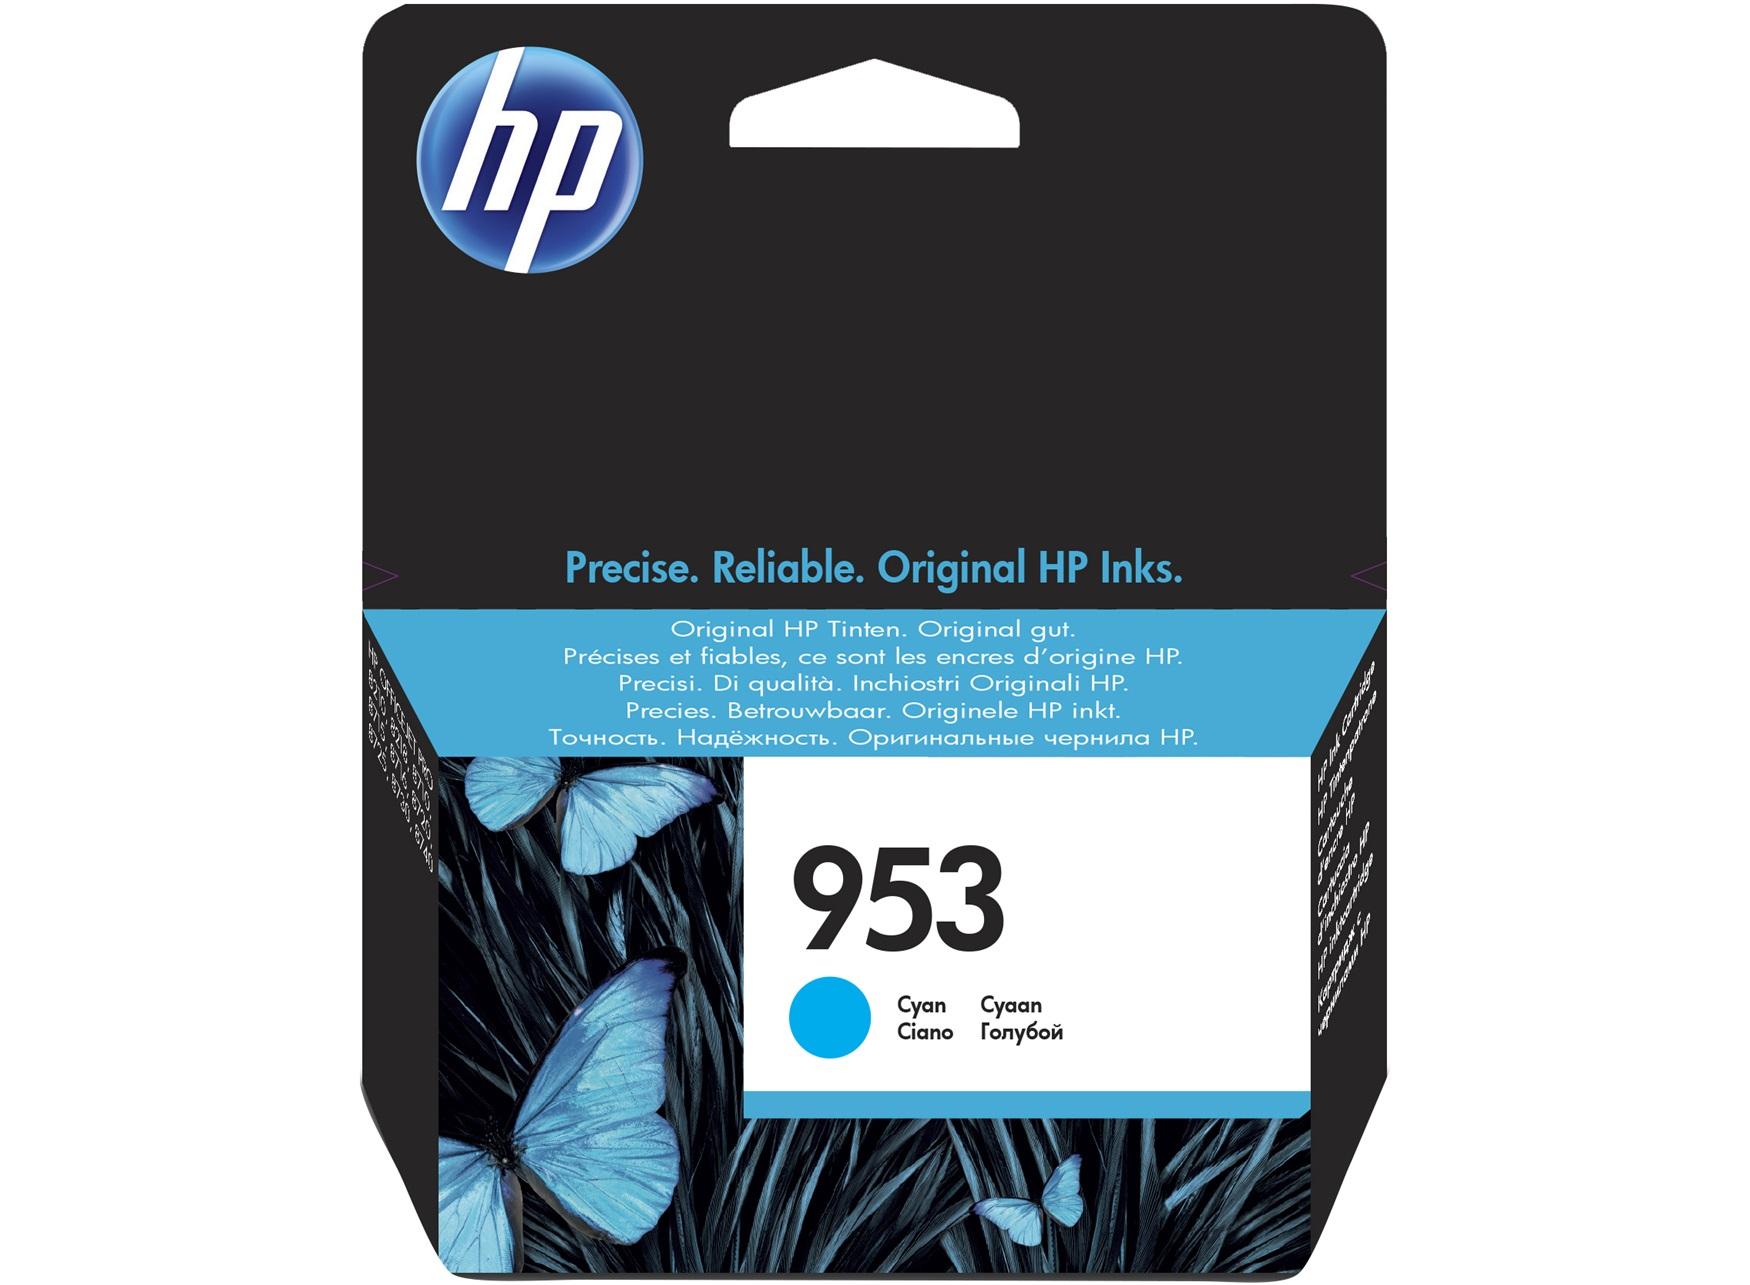 HP 953 Cyan Original Ink Cartridge 10ml 700pages Cyan ink cartridge